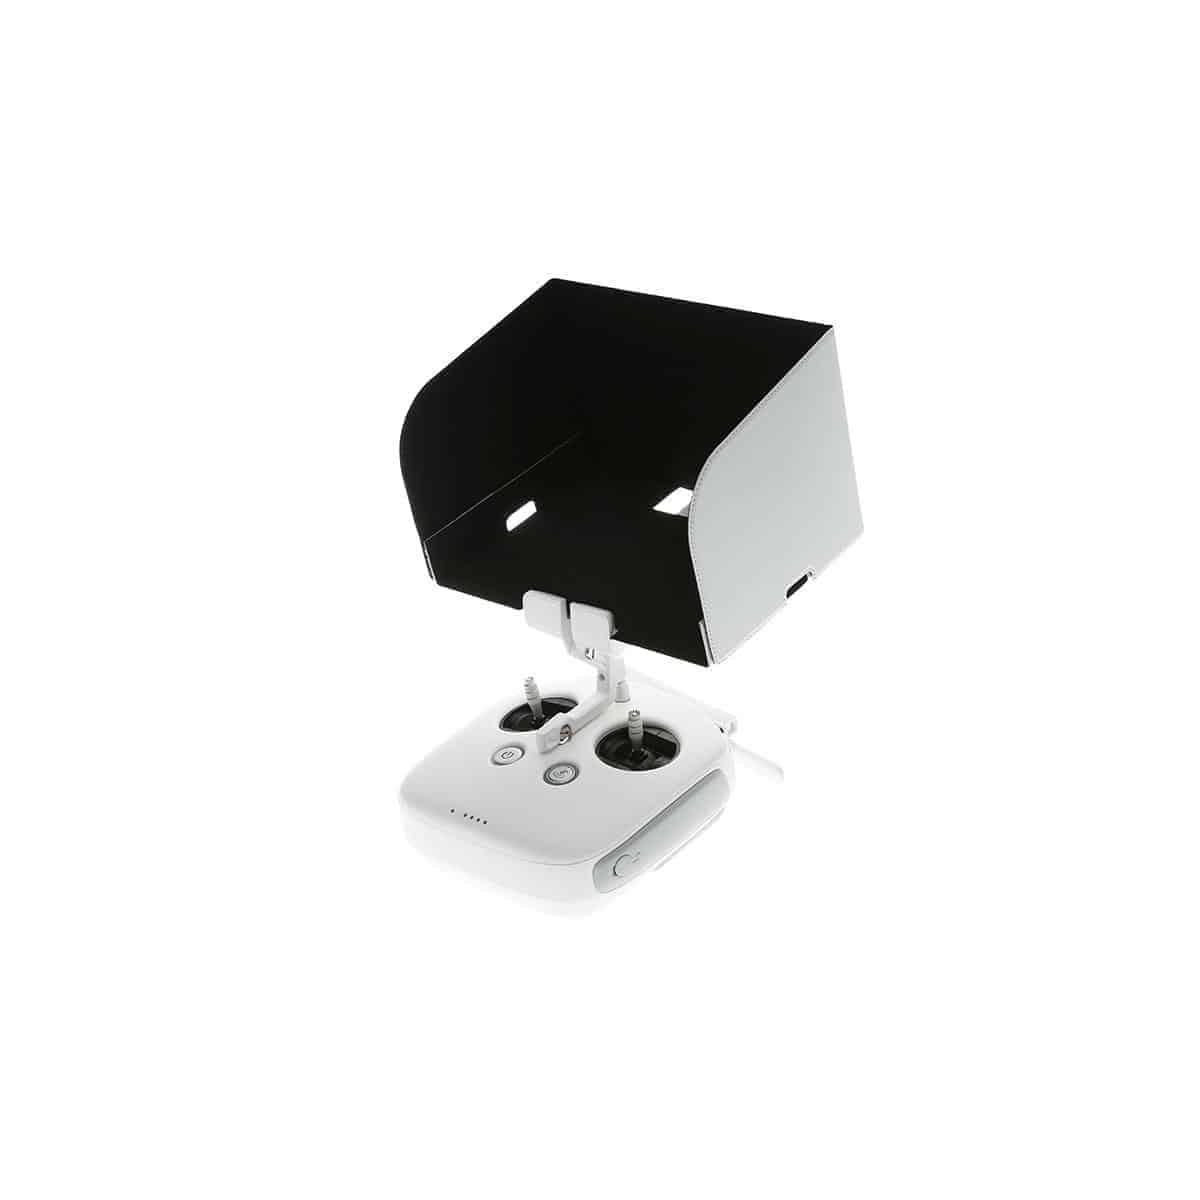 DJI Phantom 3 Remote Controller Monitor Hood (for Tablets)